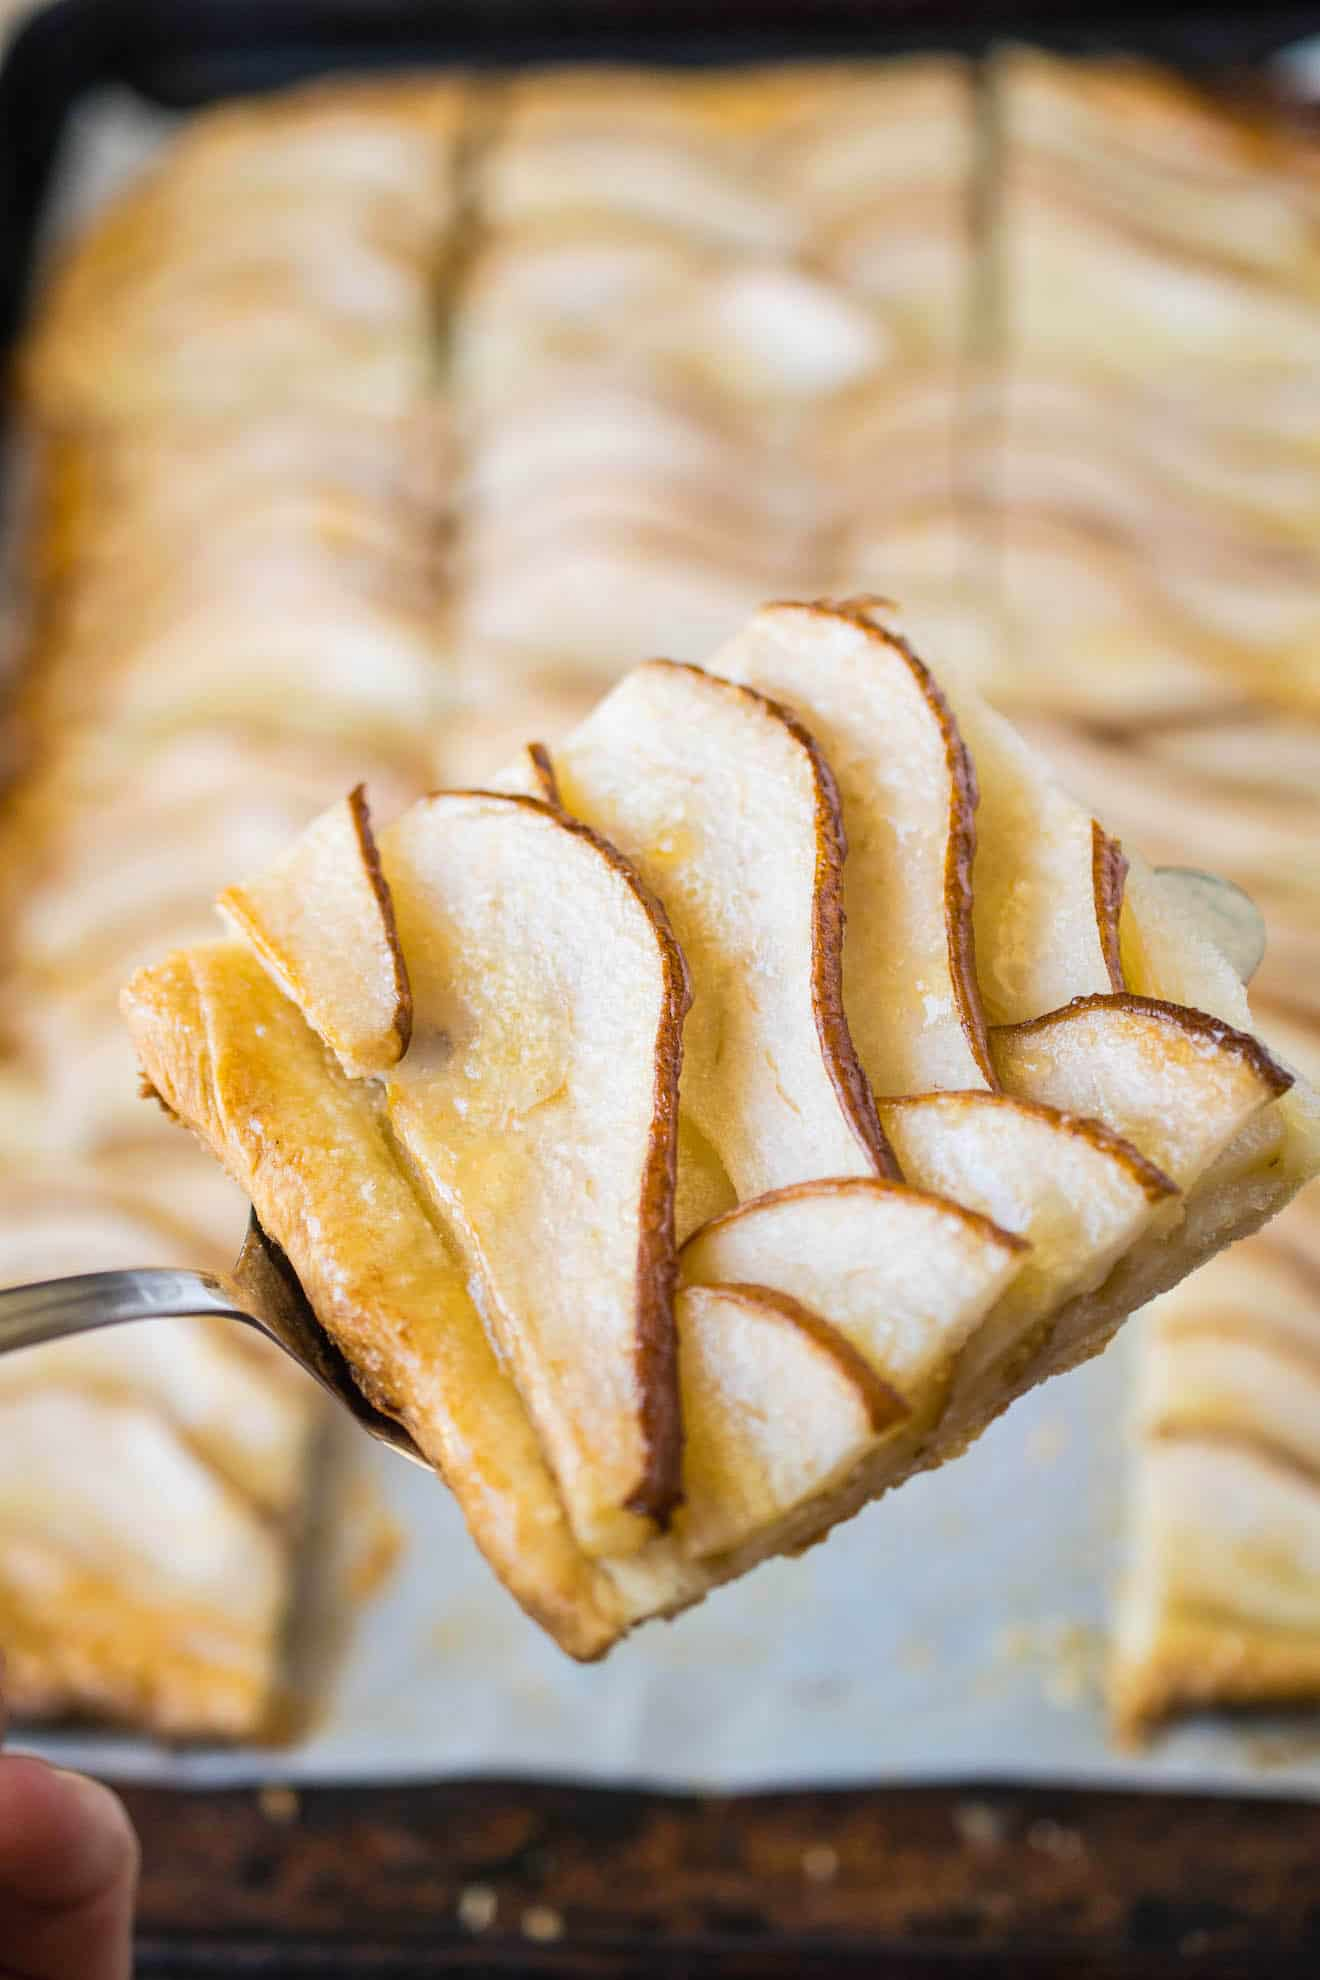 A closeup of a pear tart slice